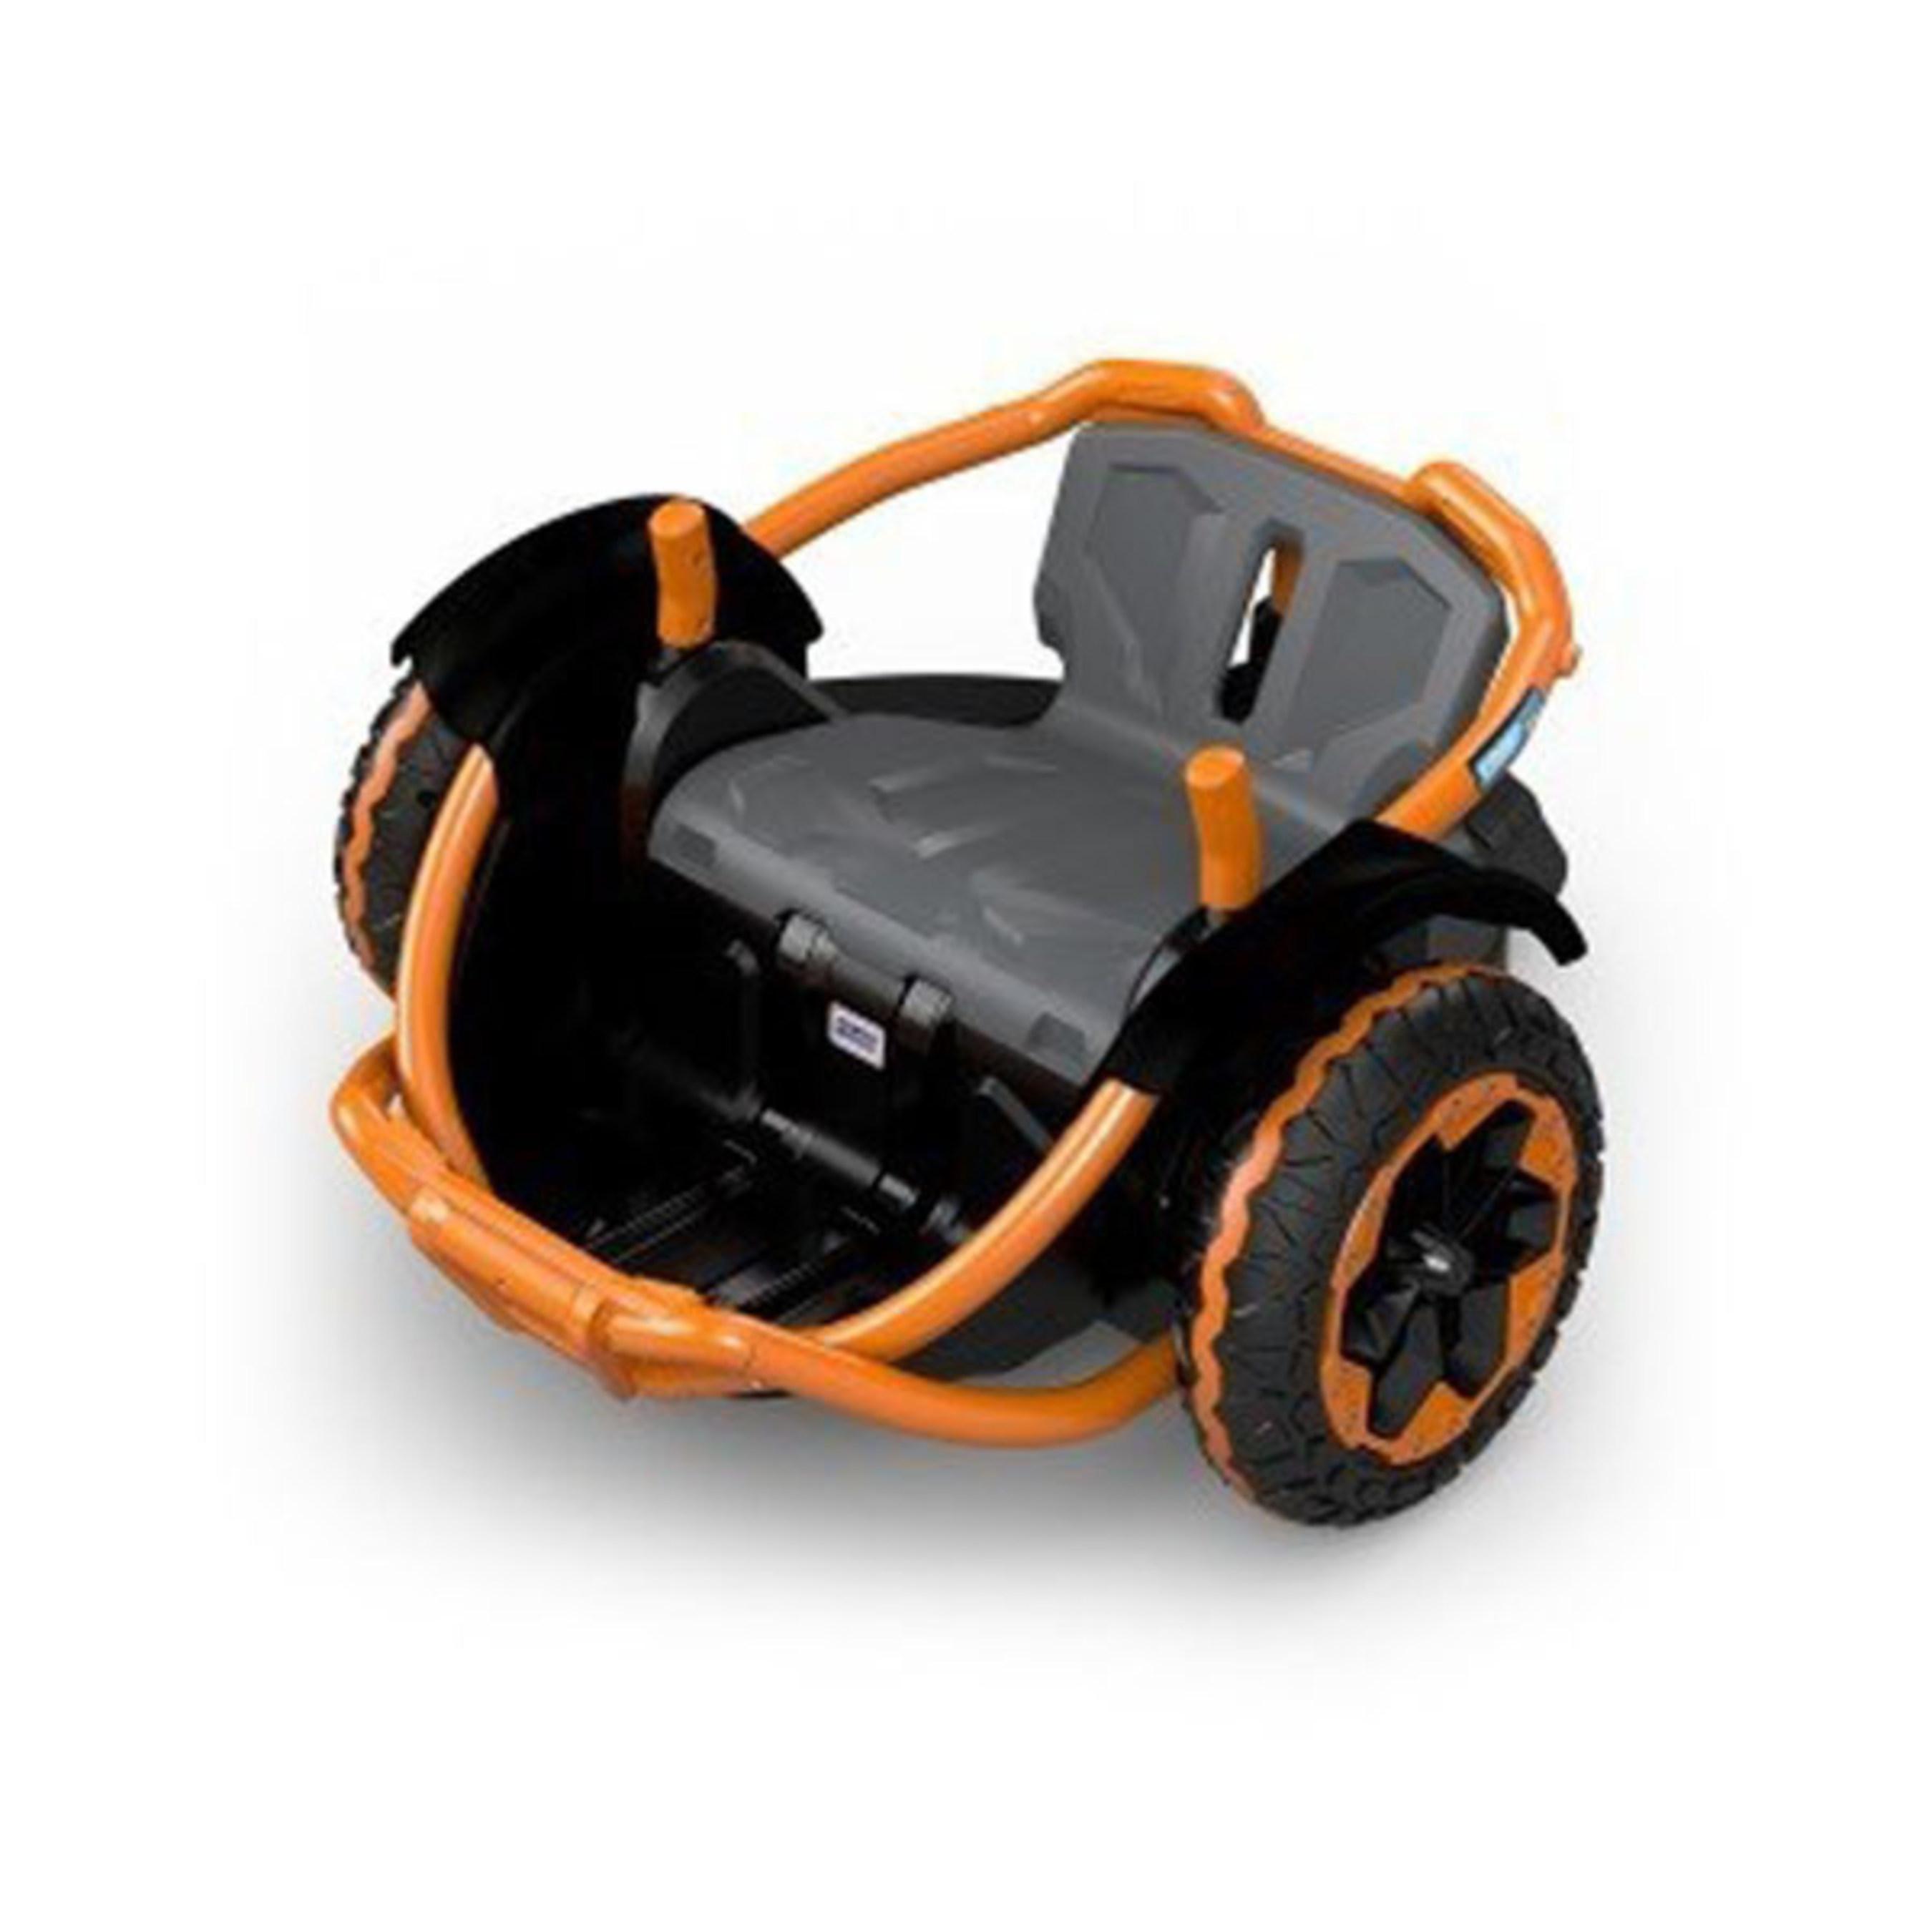 Power Wheels(R) Wild Thing(TM) from Power Wheels(R)